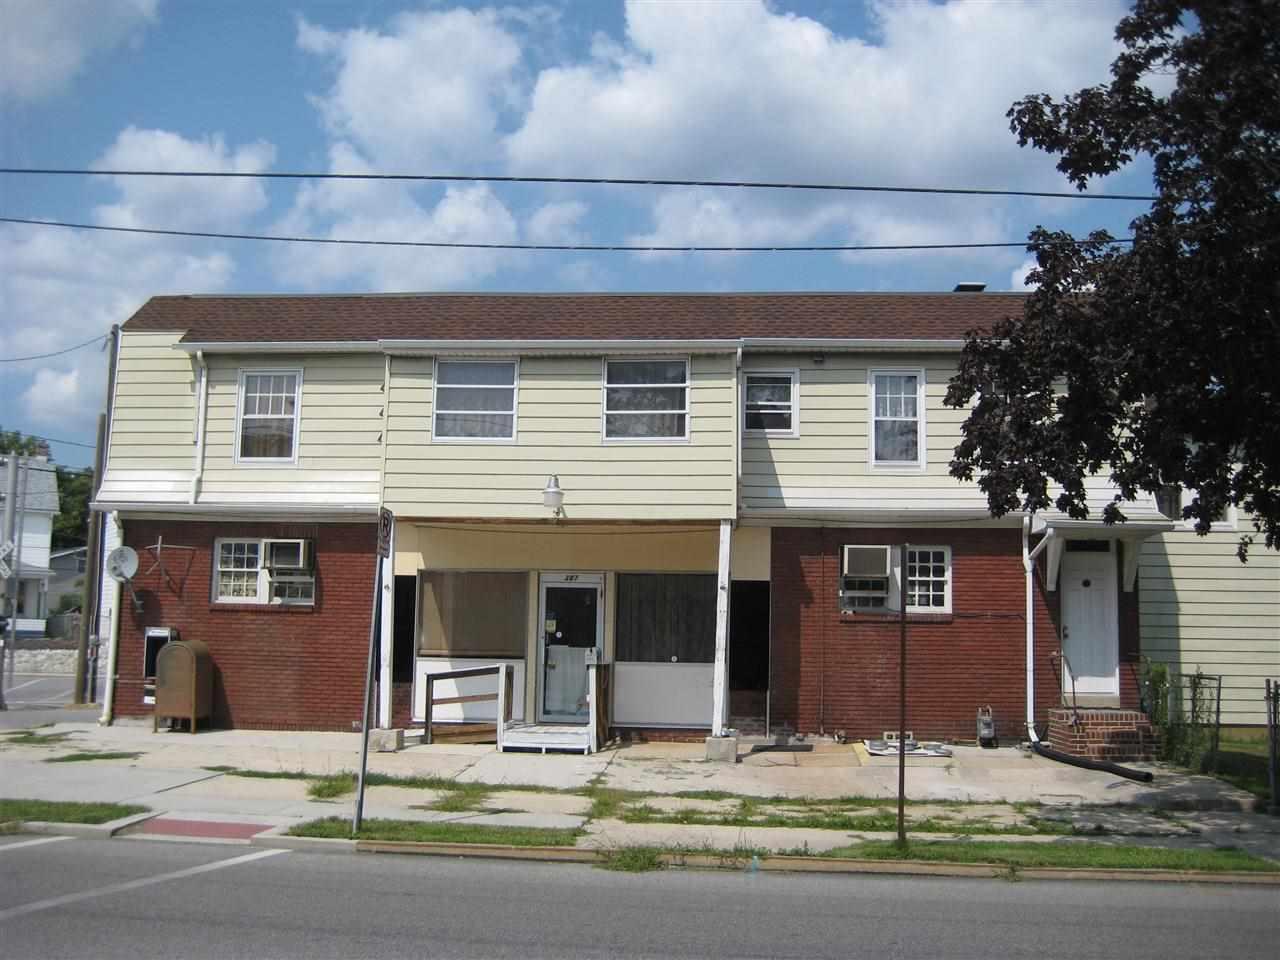 387 High St, Hanover, PA 17331